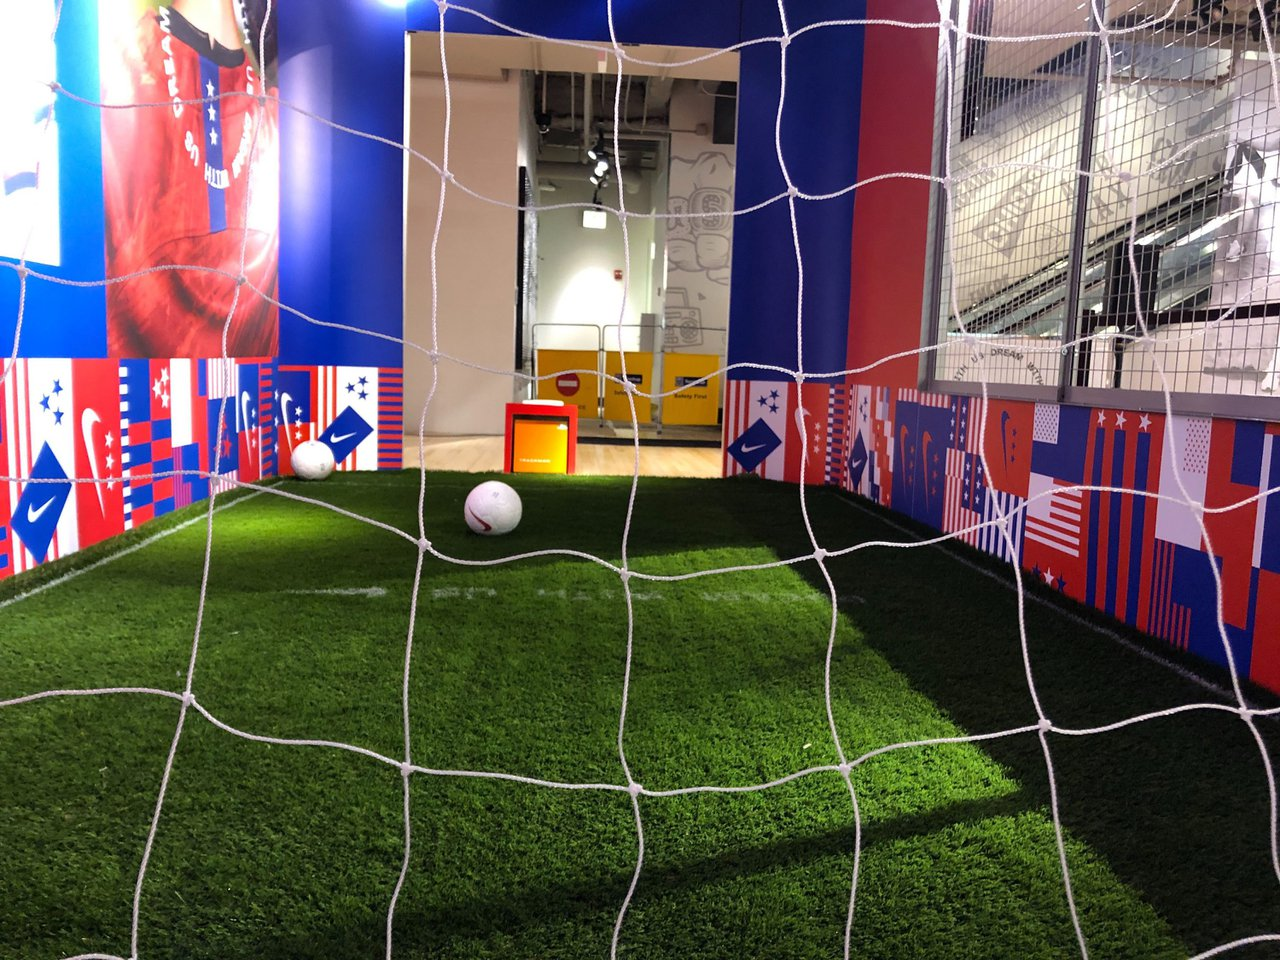 Nike Speed Kick Interactive Game photo image_from_ios.jpg